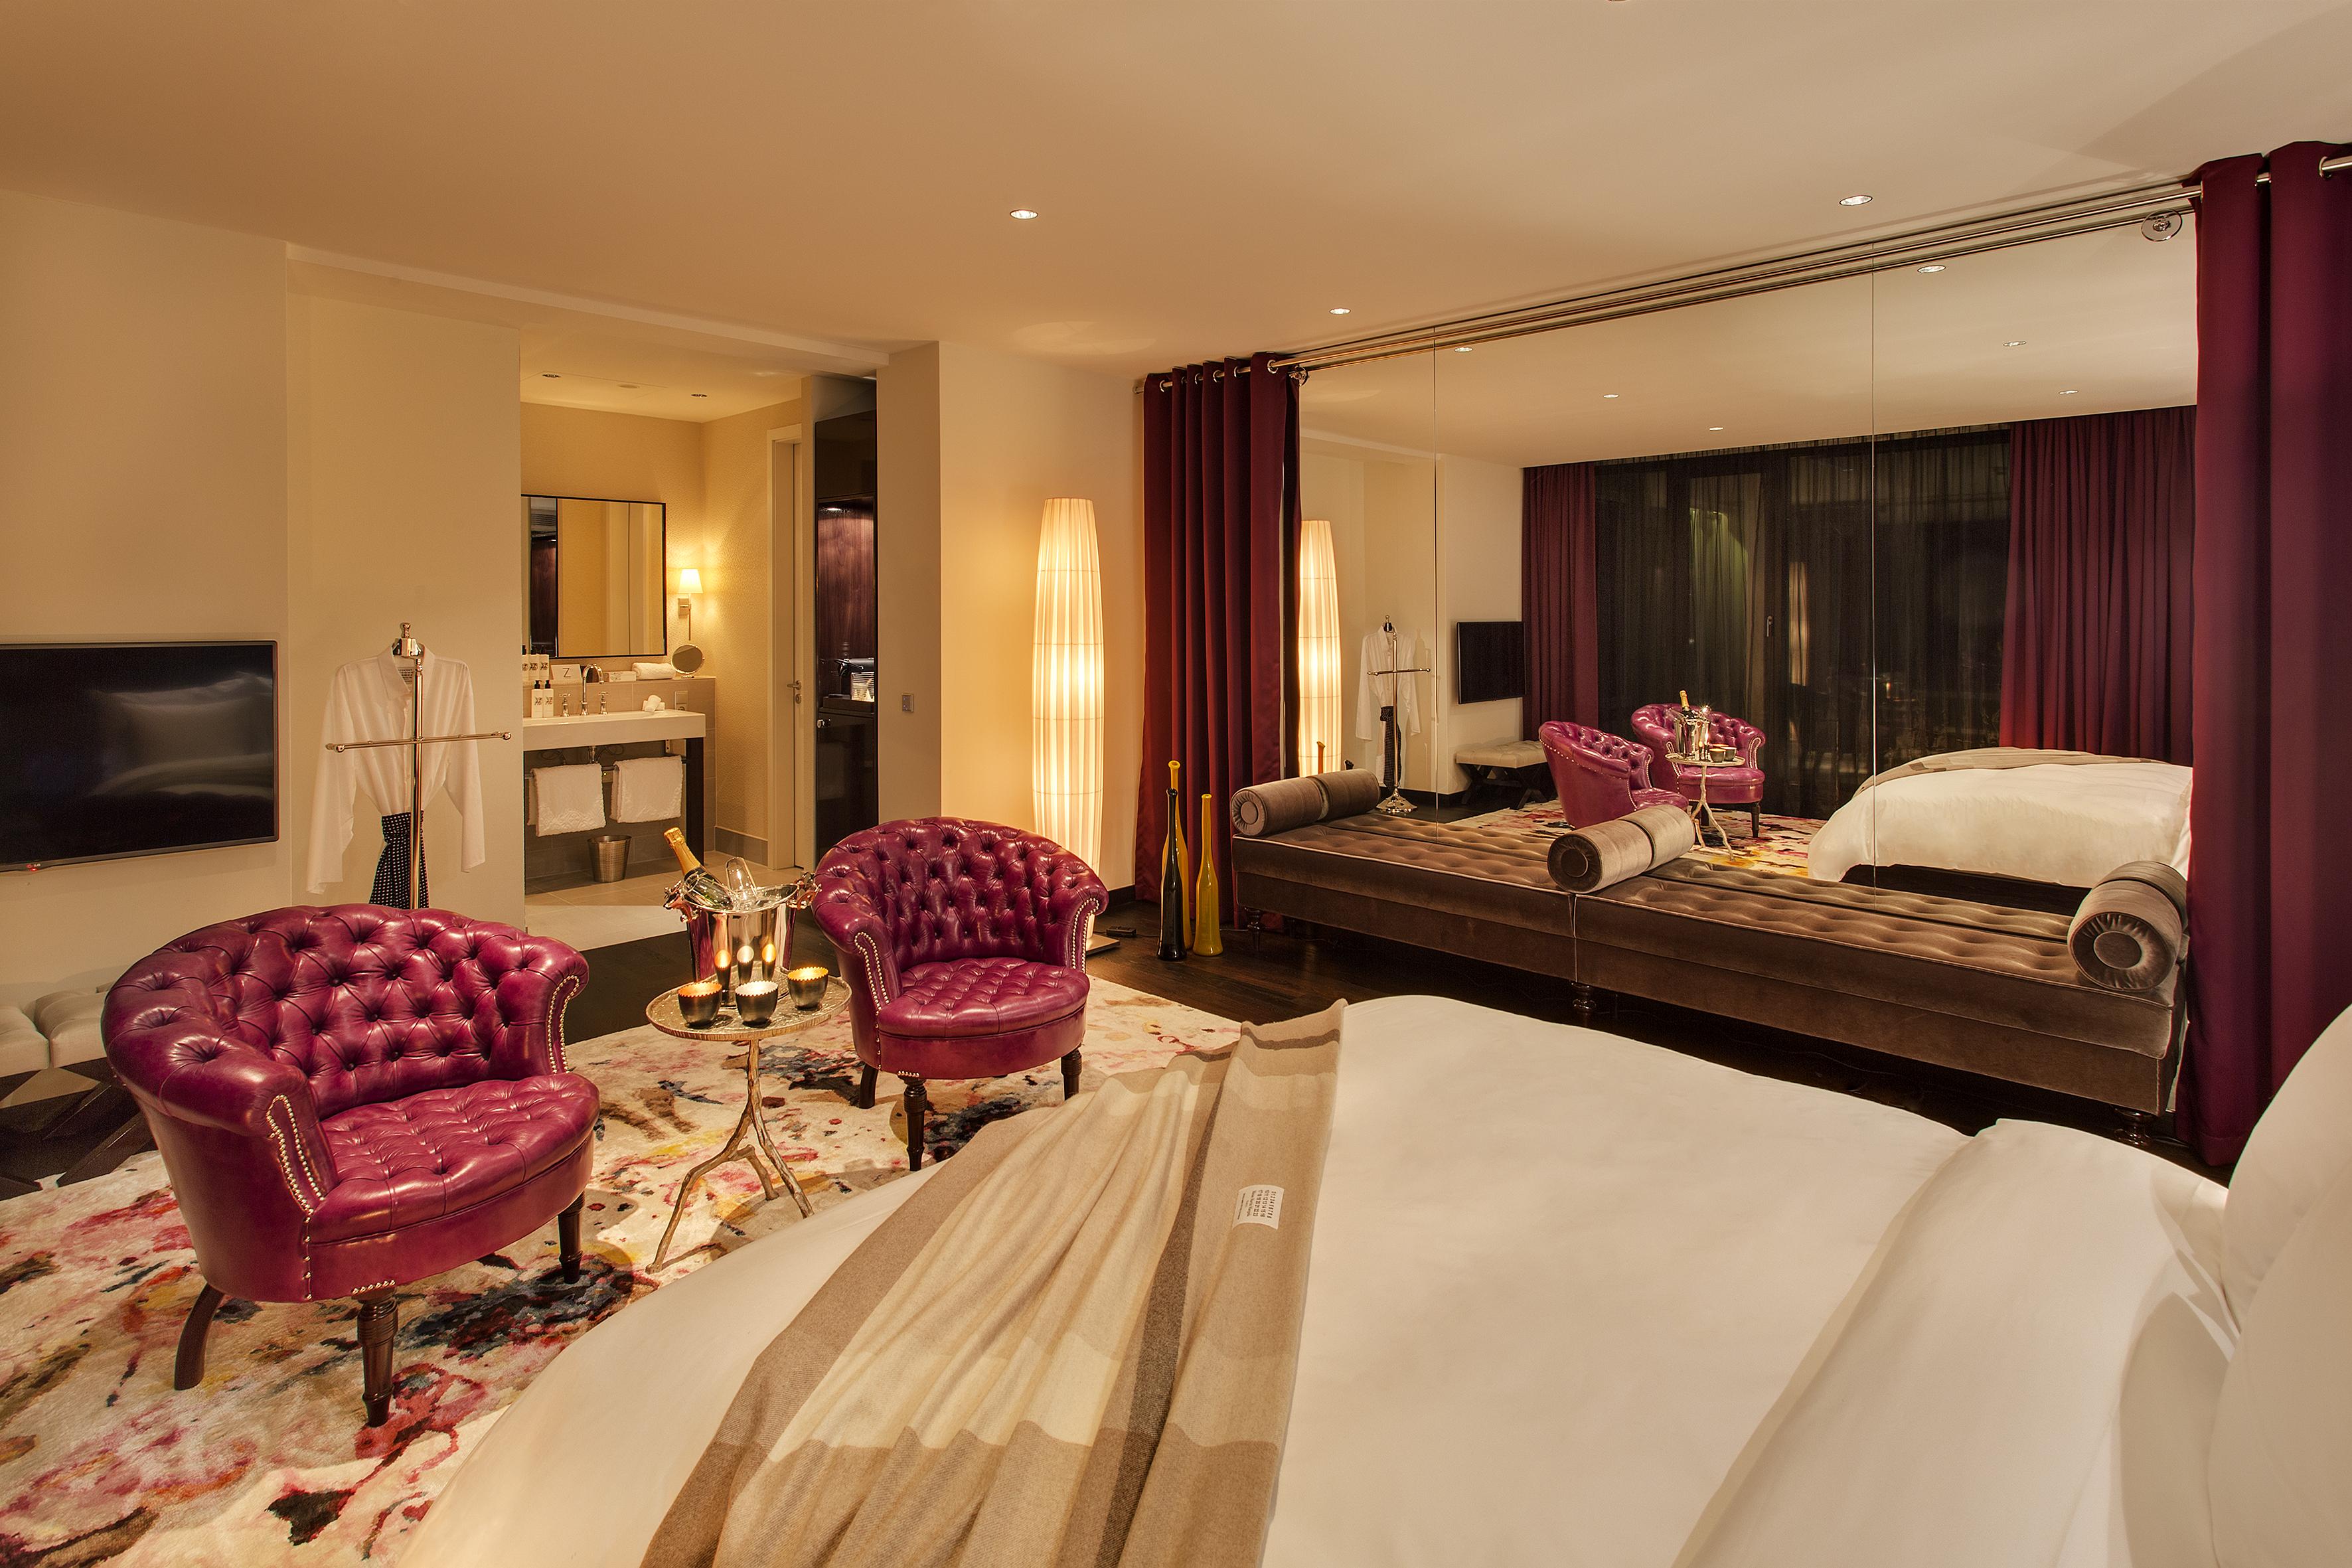 hotel-zoo-berlin_18192373839_o